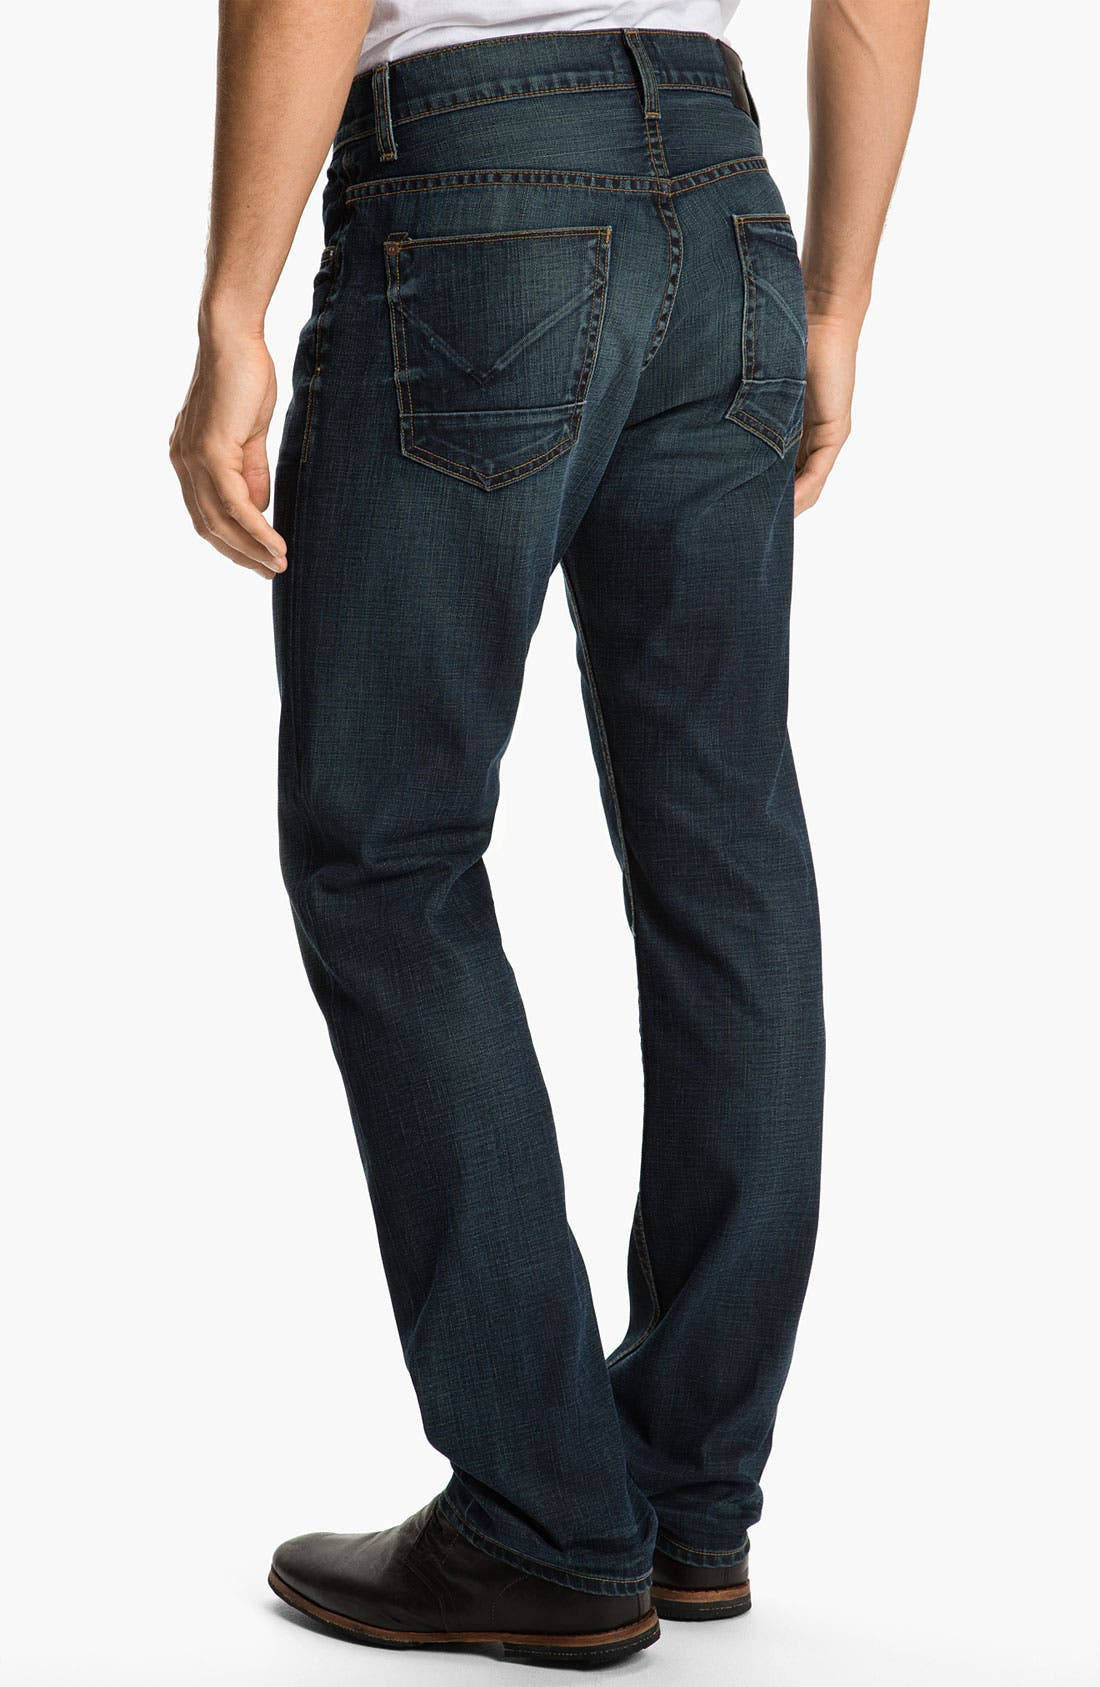 Main Image - Hudson Jeans 'Dandy' Slouchy Straight Leg Jeans (Shovel)